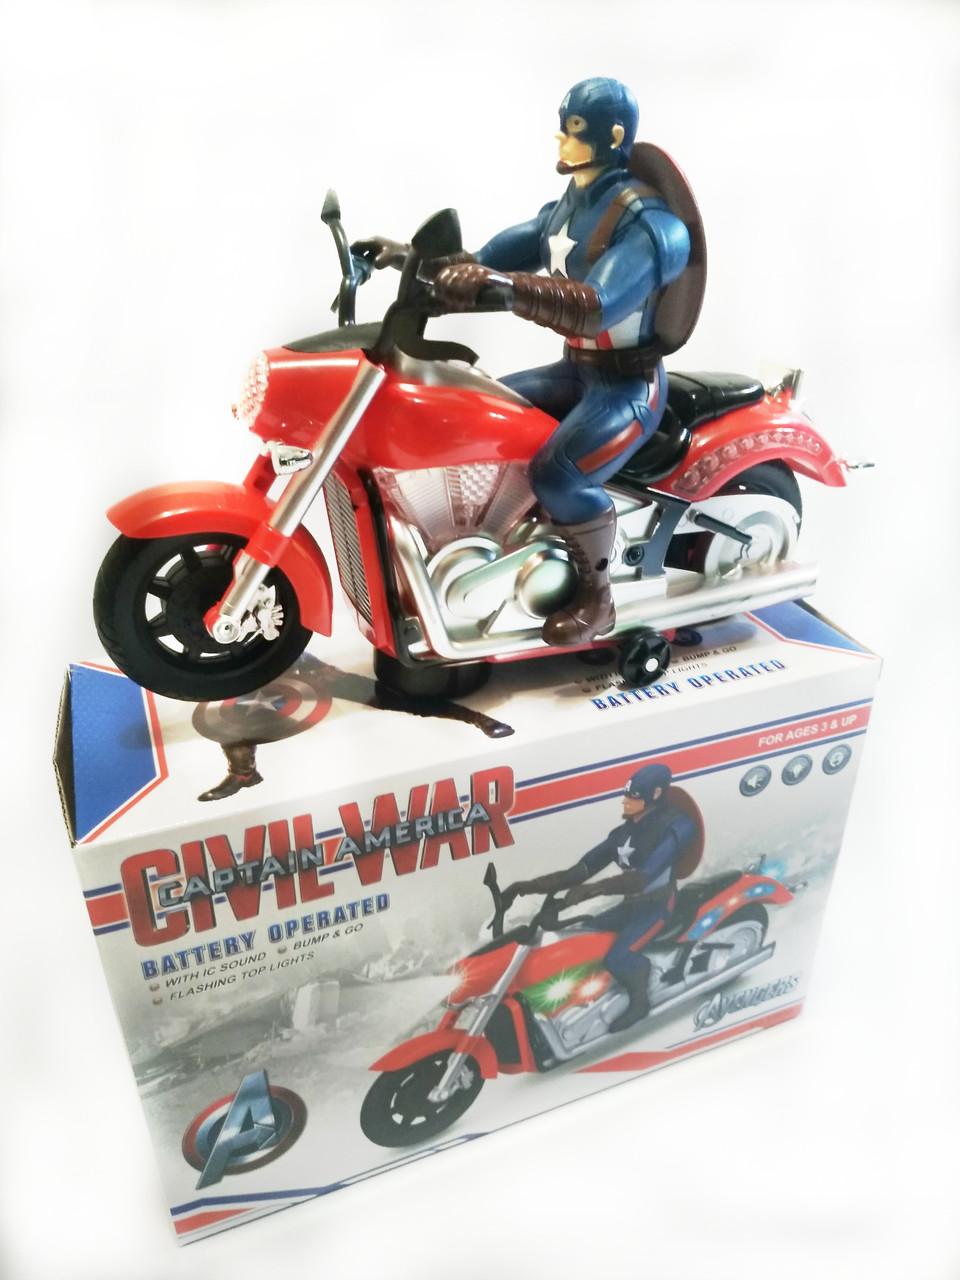 Капитан Америка на мотоцикле ABC интерактивный